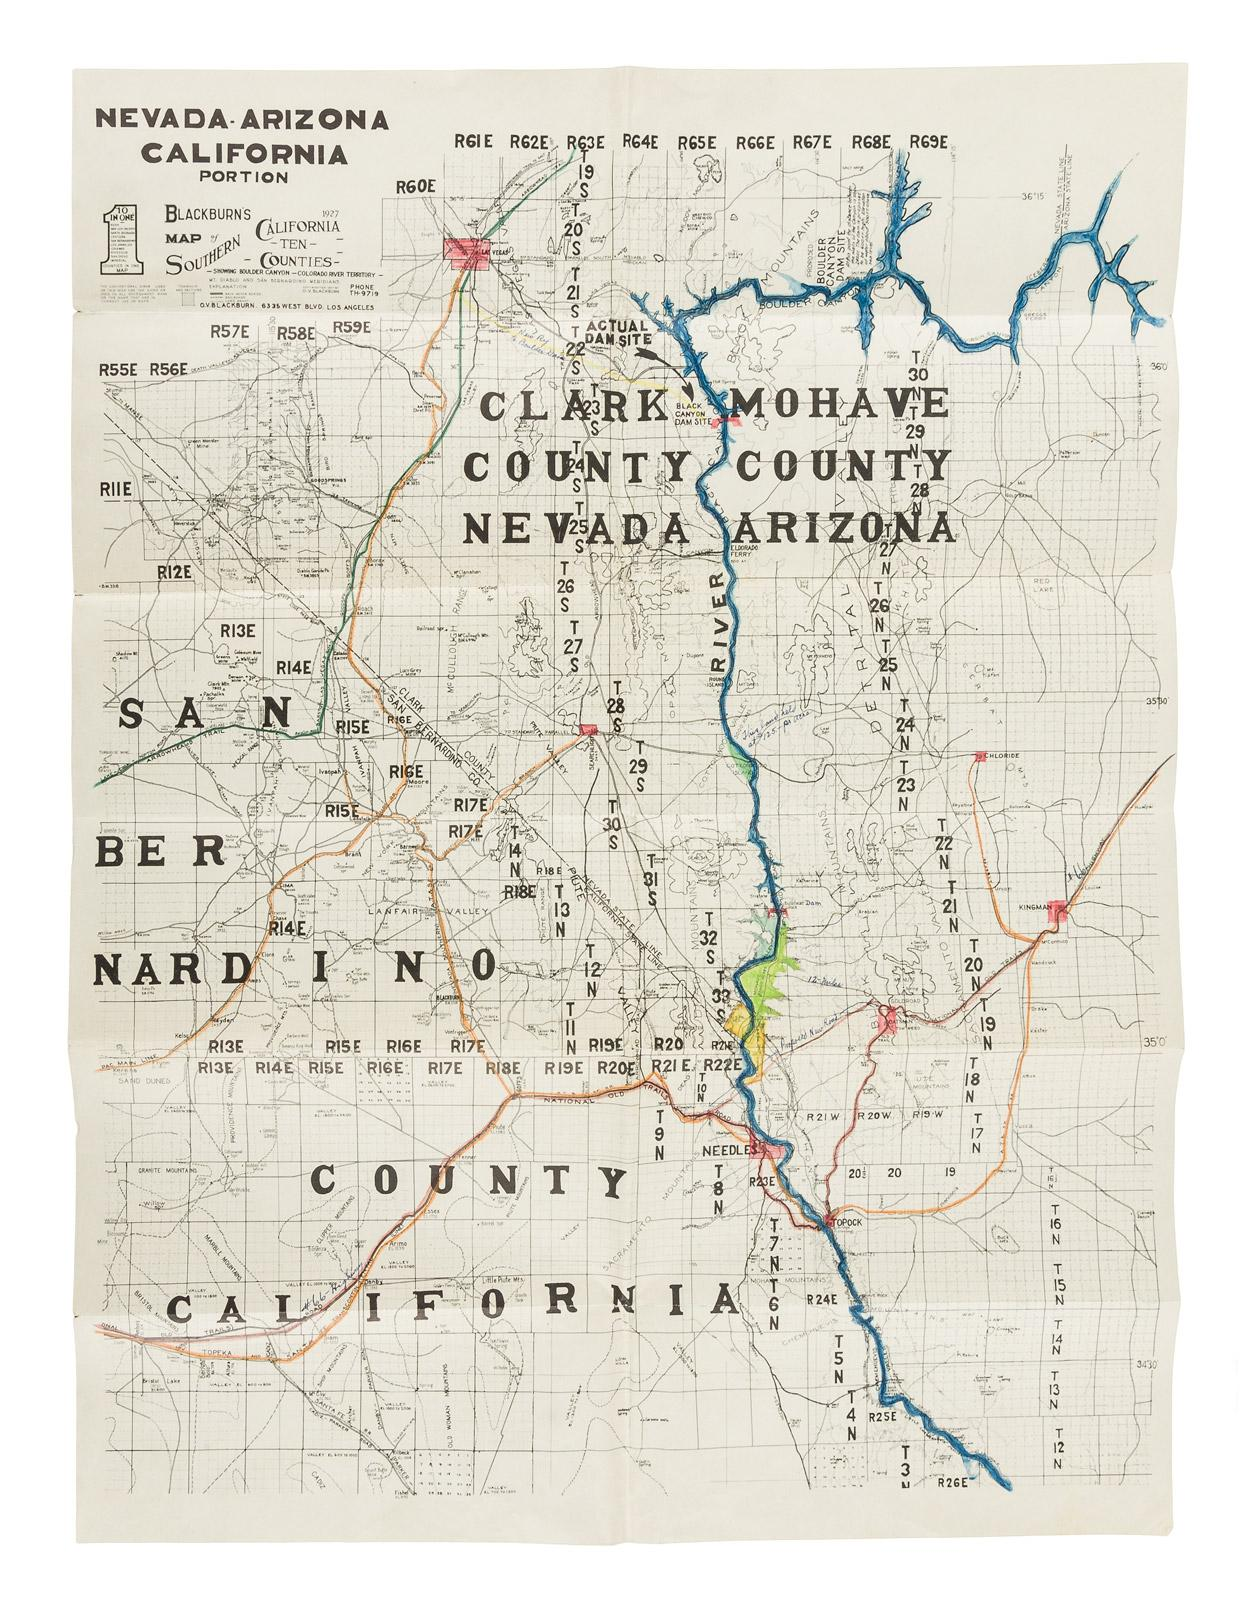 Map Of Nevada And Arizona.Nevada Arizona California Portion Blackburn S 1927 Map Of Southern